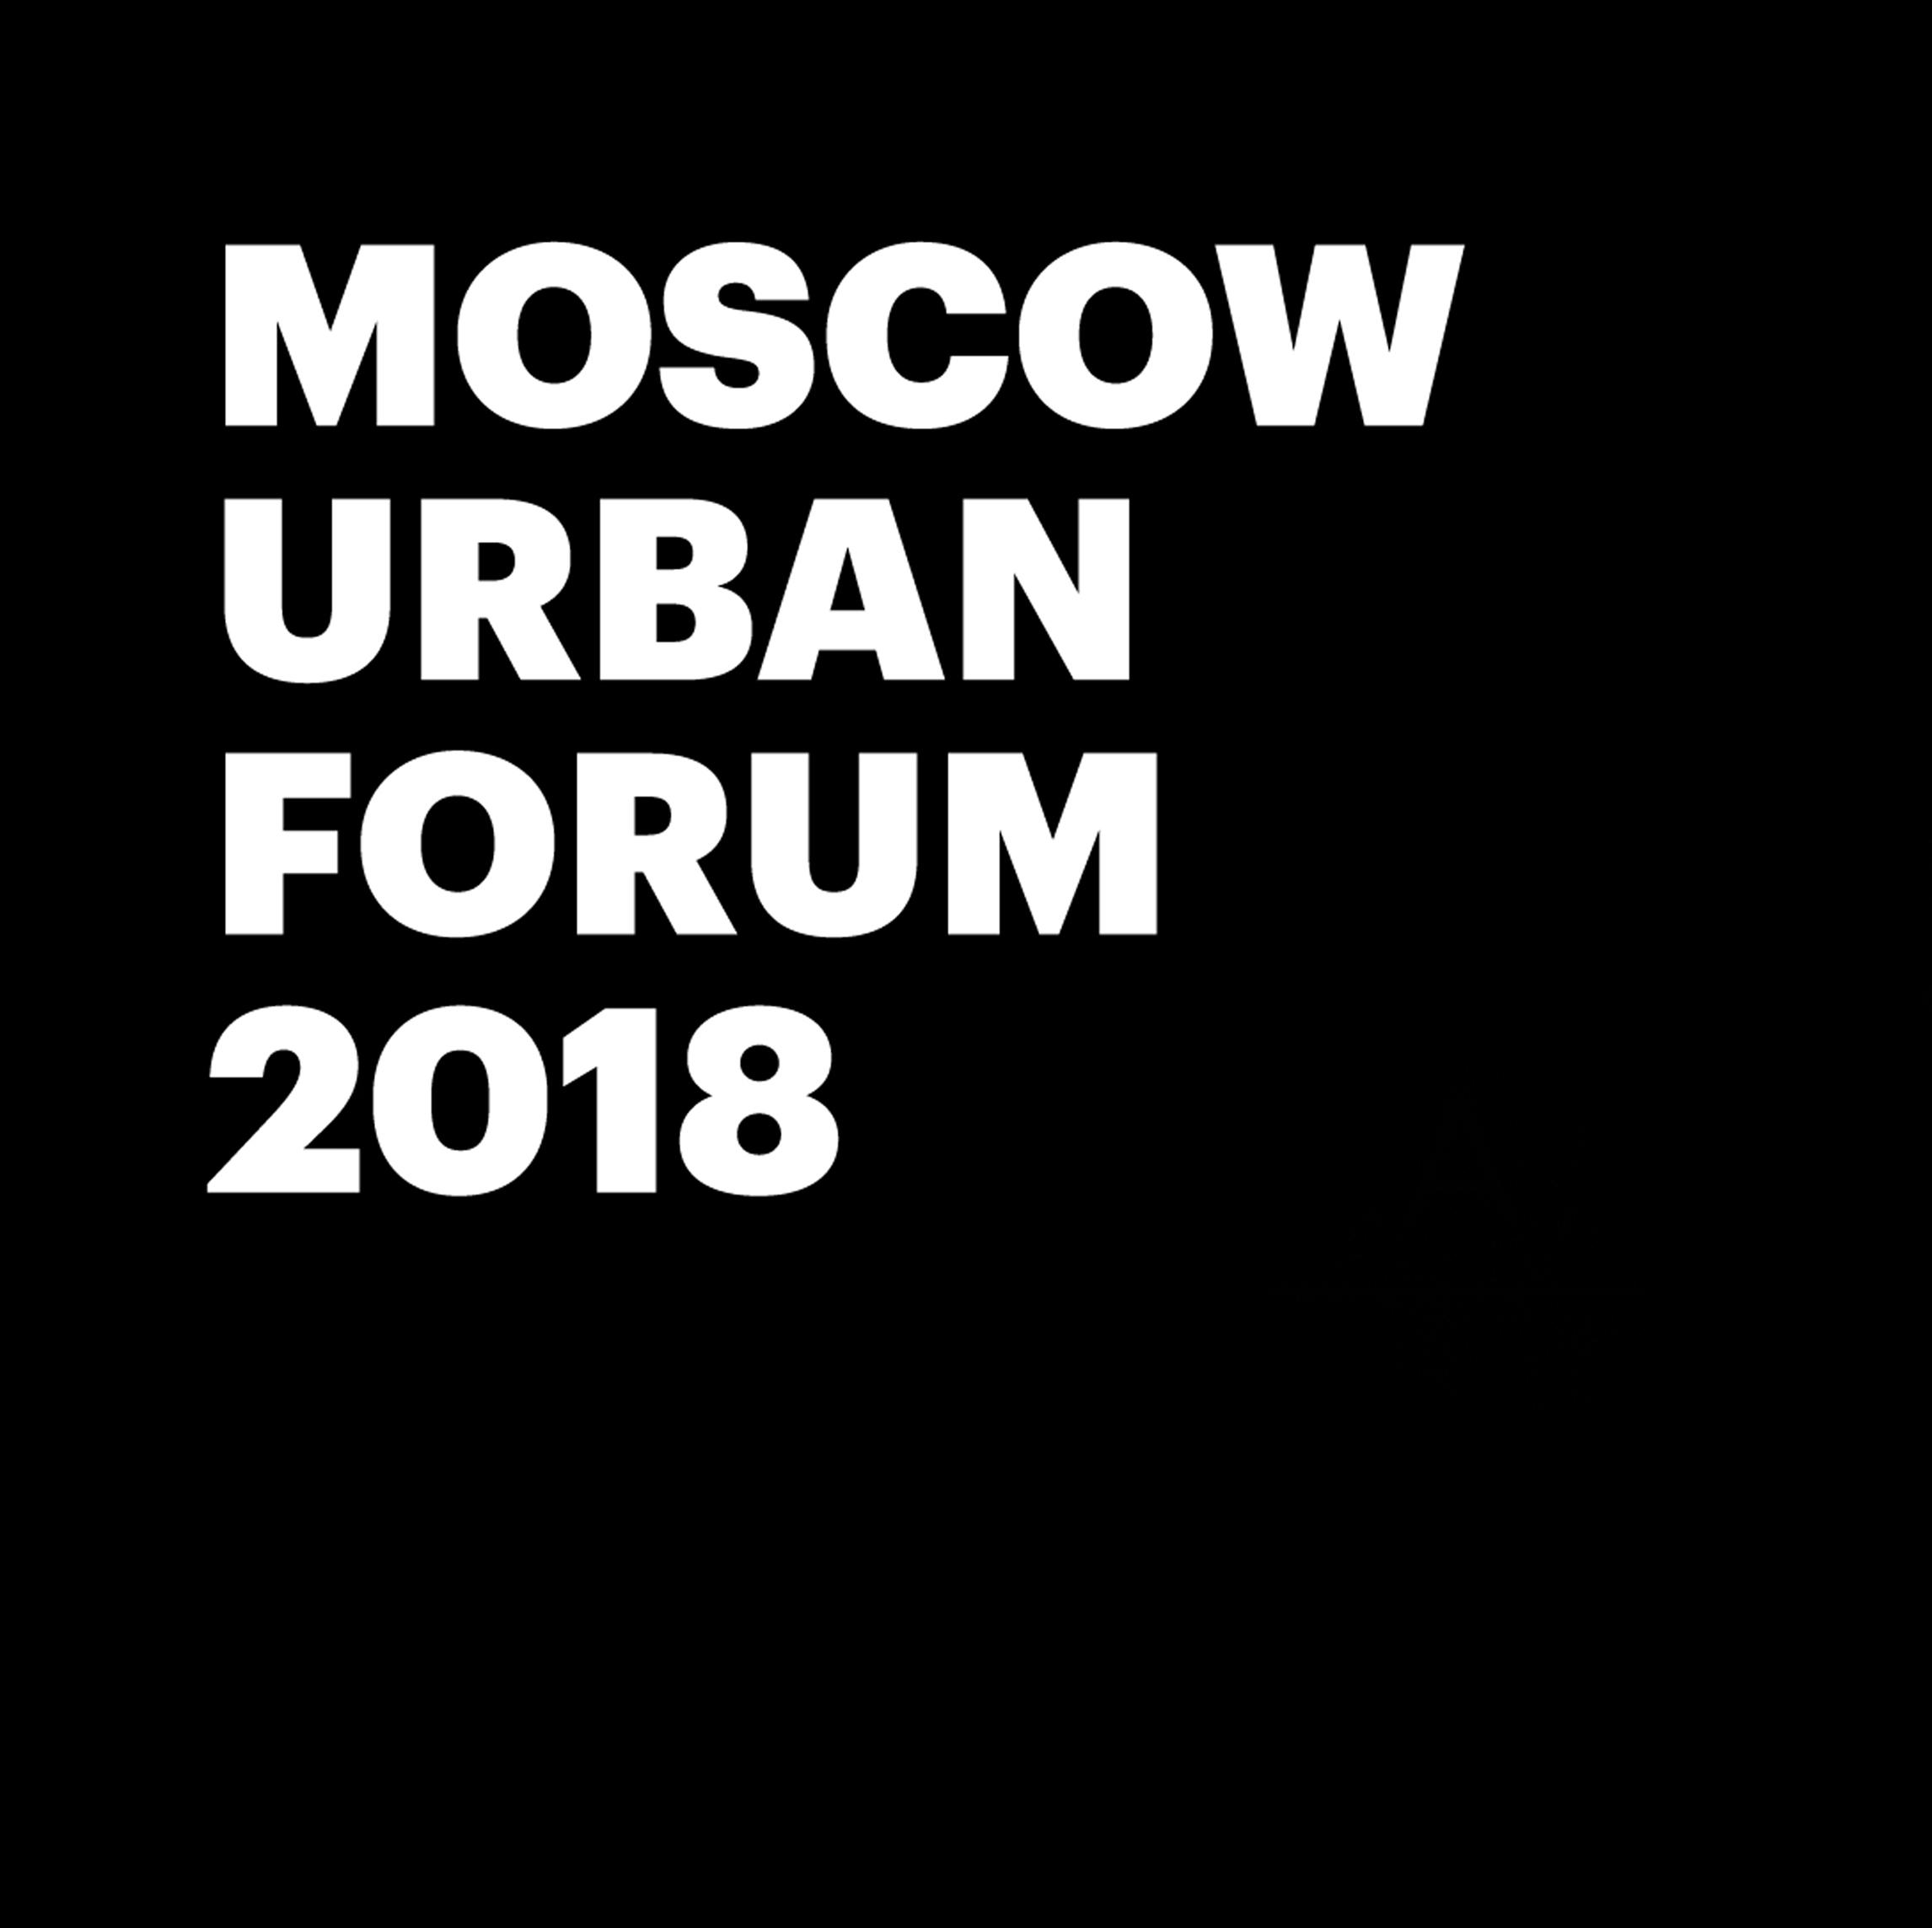 MOSCOW URBAN FORUM / 2018